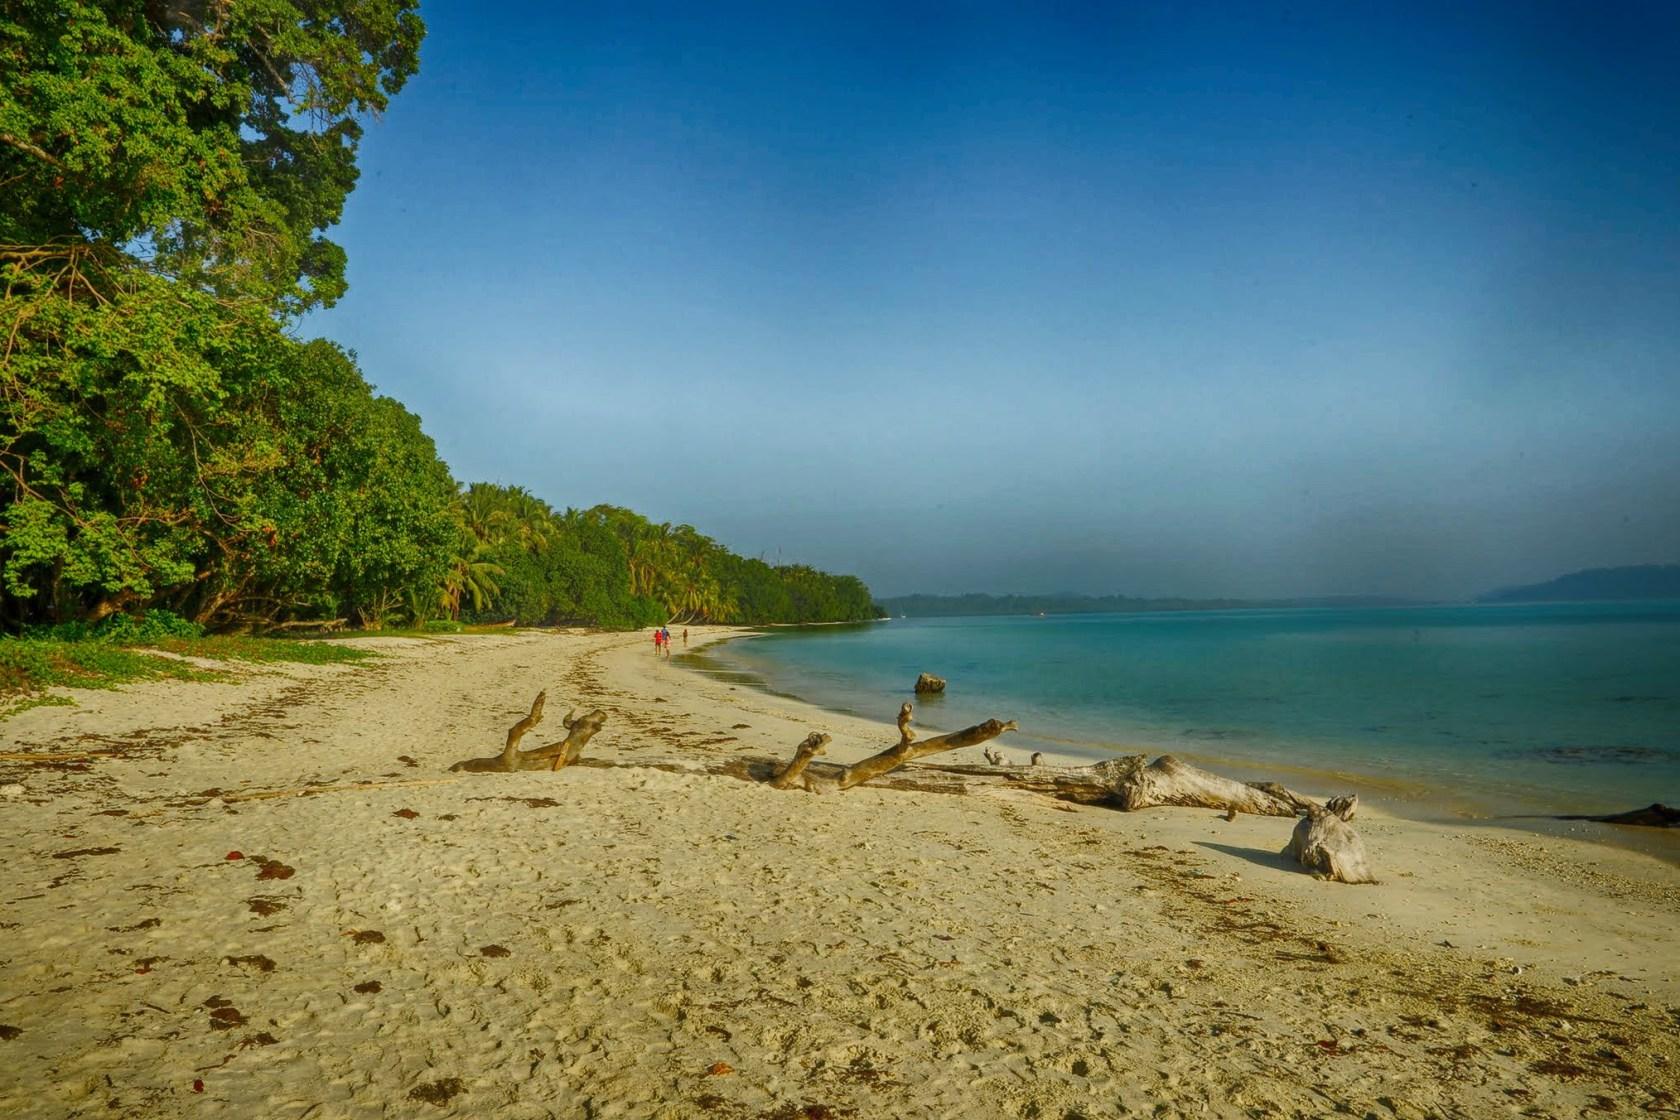 Beautiful-Havelok-Beach-Dolphin-Resort-HD-landscape-wallpaper-wp5803890